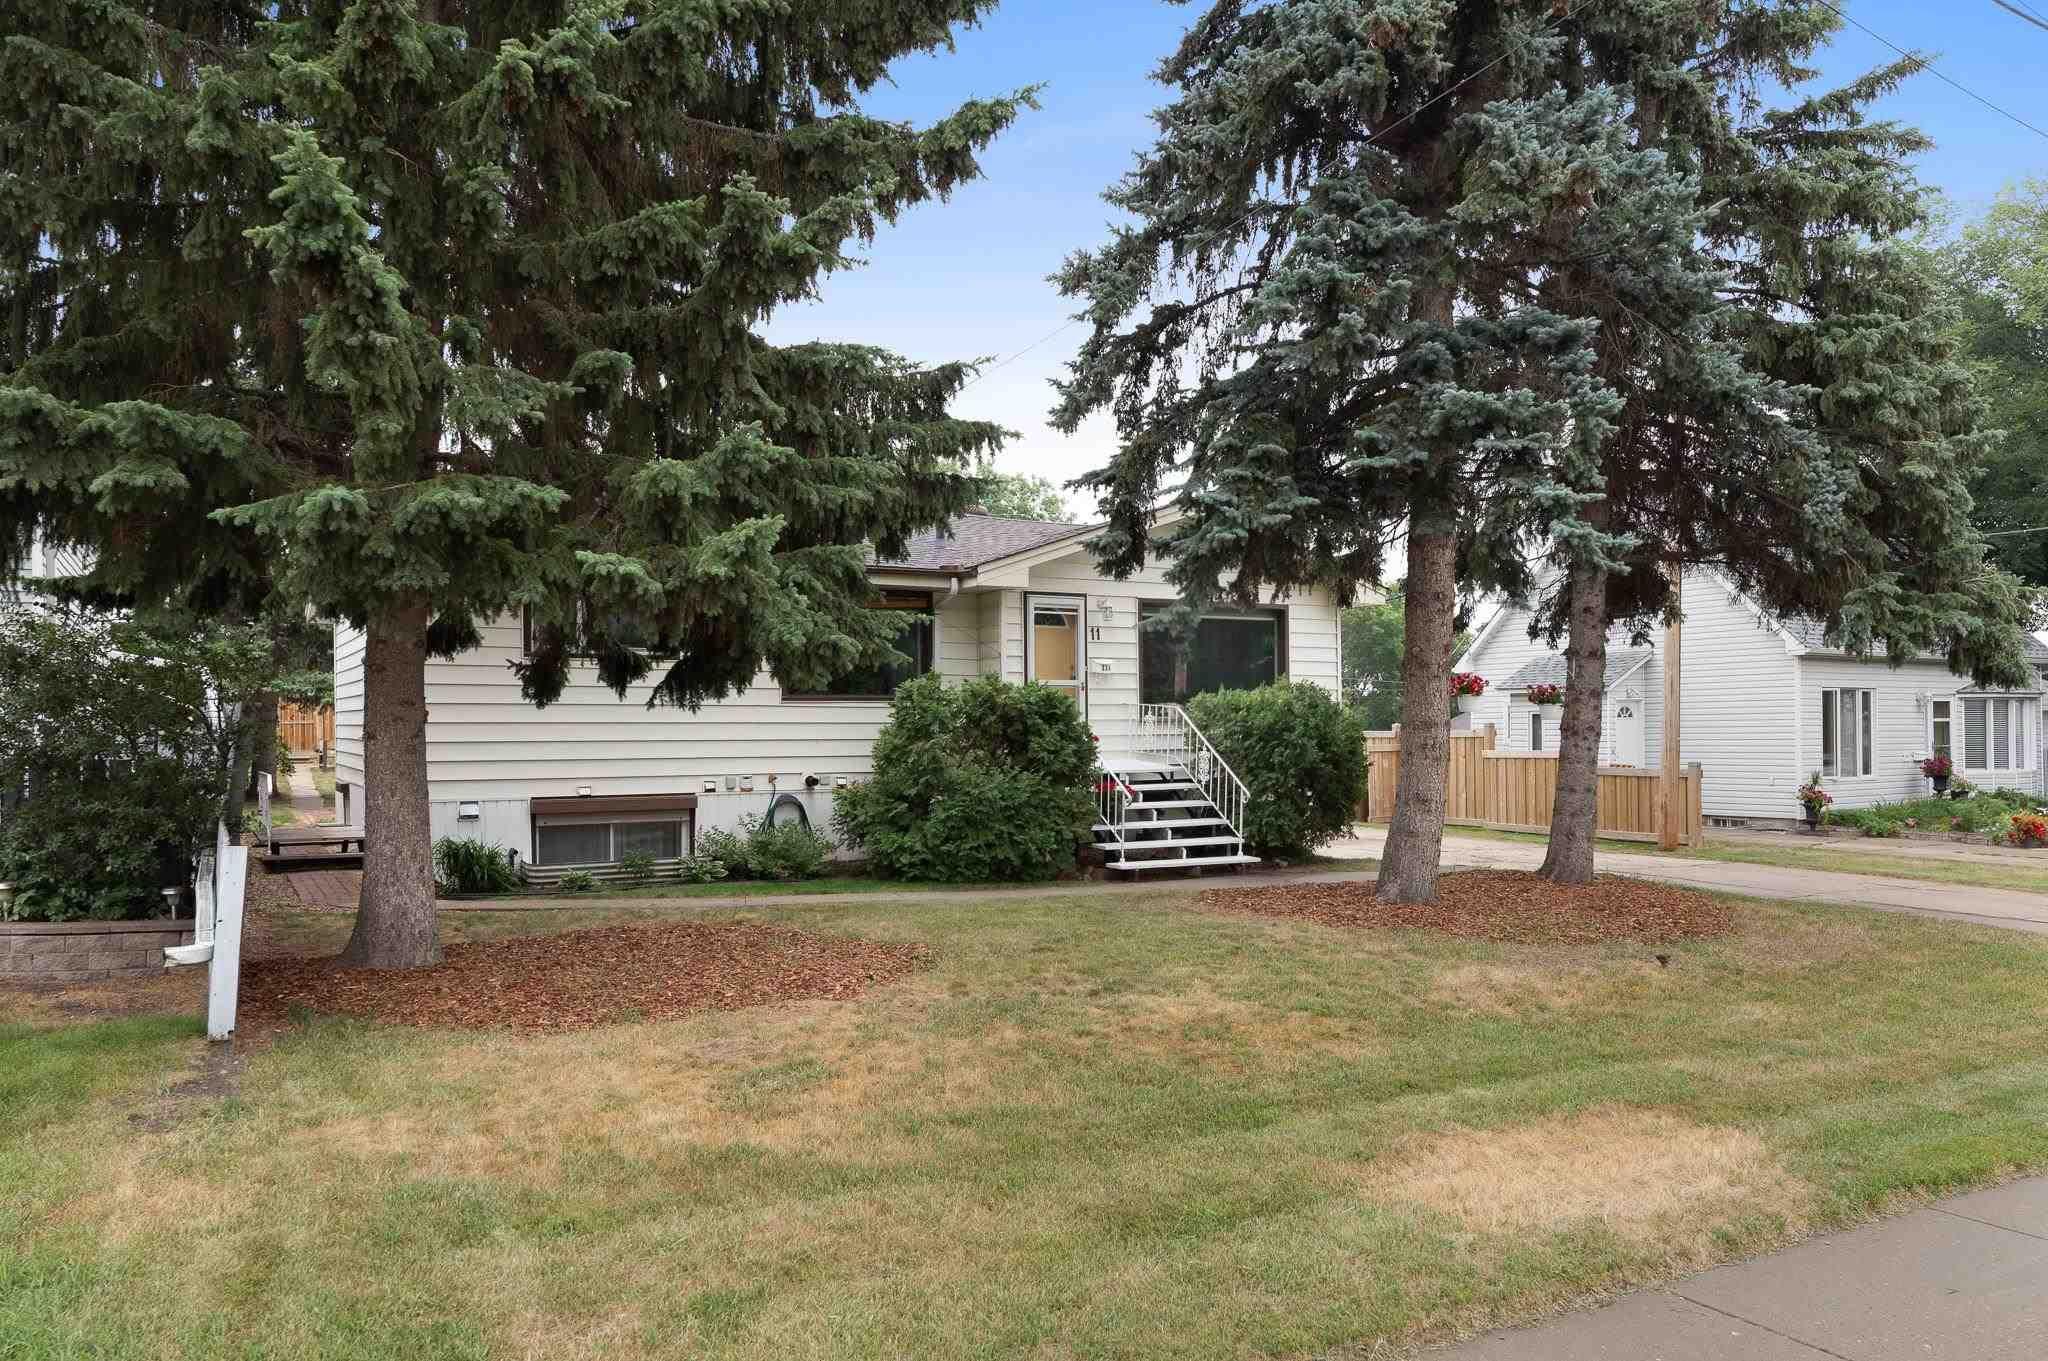 Main Photo: 11 MOUNT ROYAL Drive: St. Albert House for sale : MLS®# E4257349